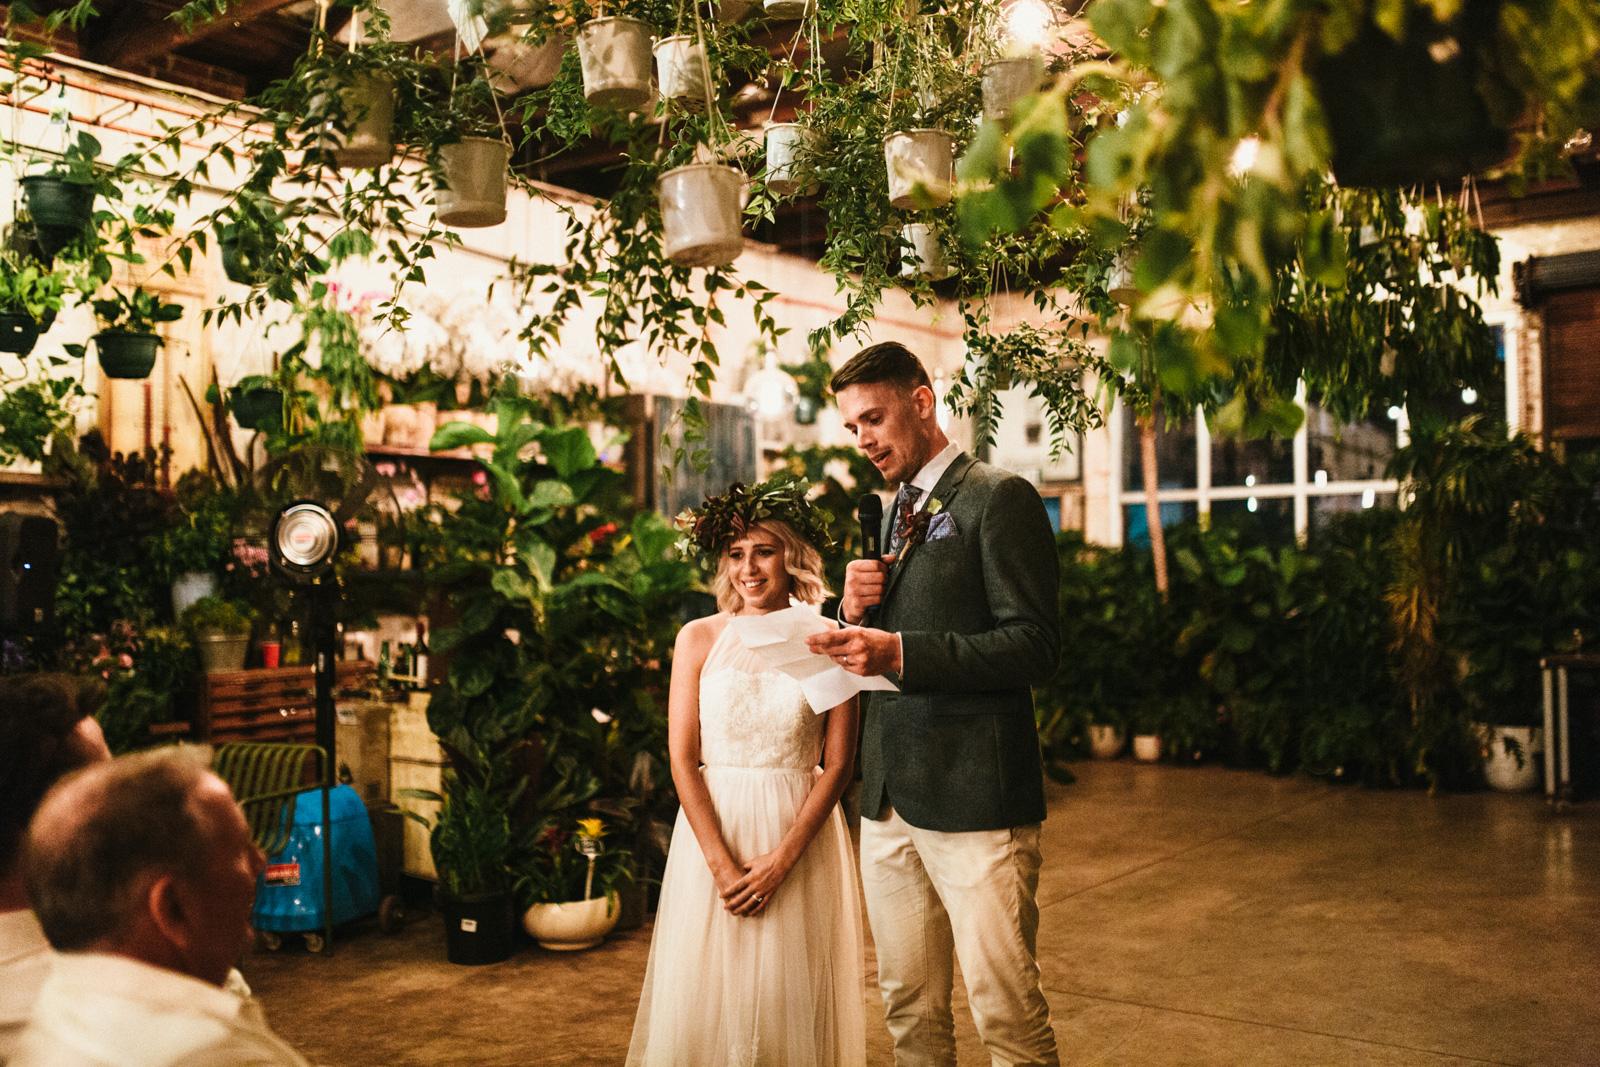 D+S-Melbourne Wedding Photographer-Glasshaus-Dean Raphael-114.jpg